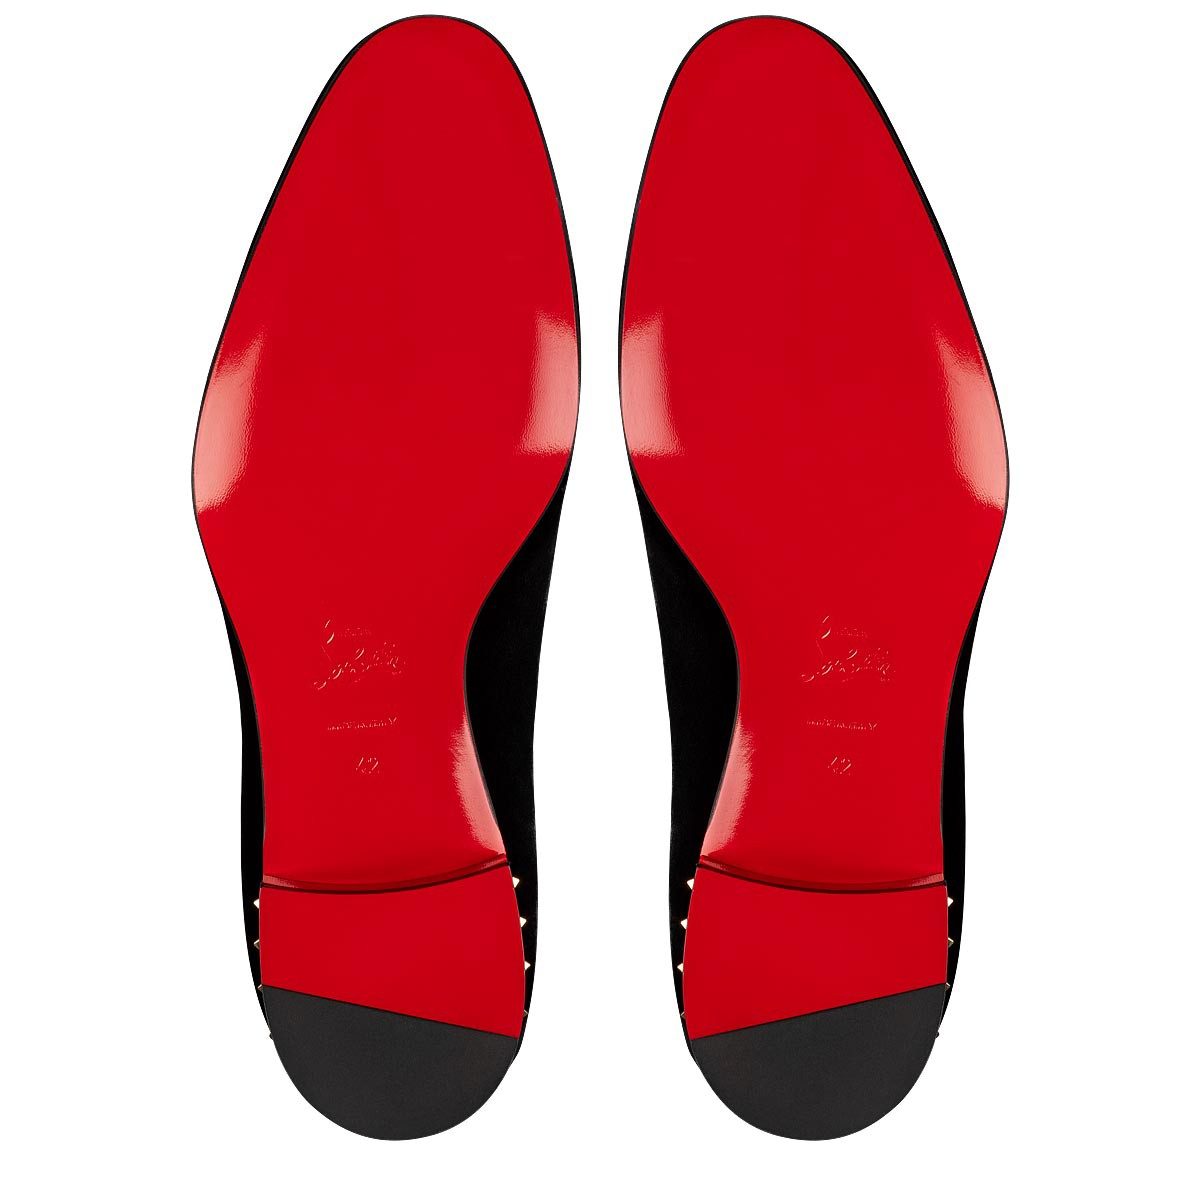 Shoes - Marpyramide - Christian Louboutin